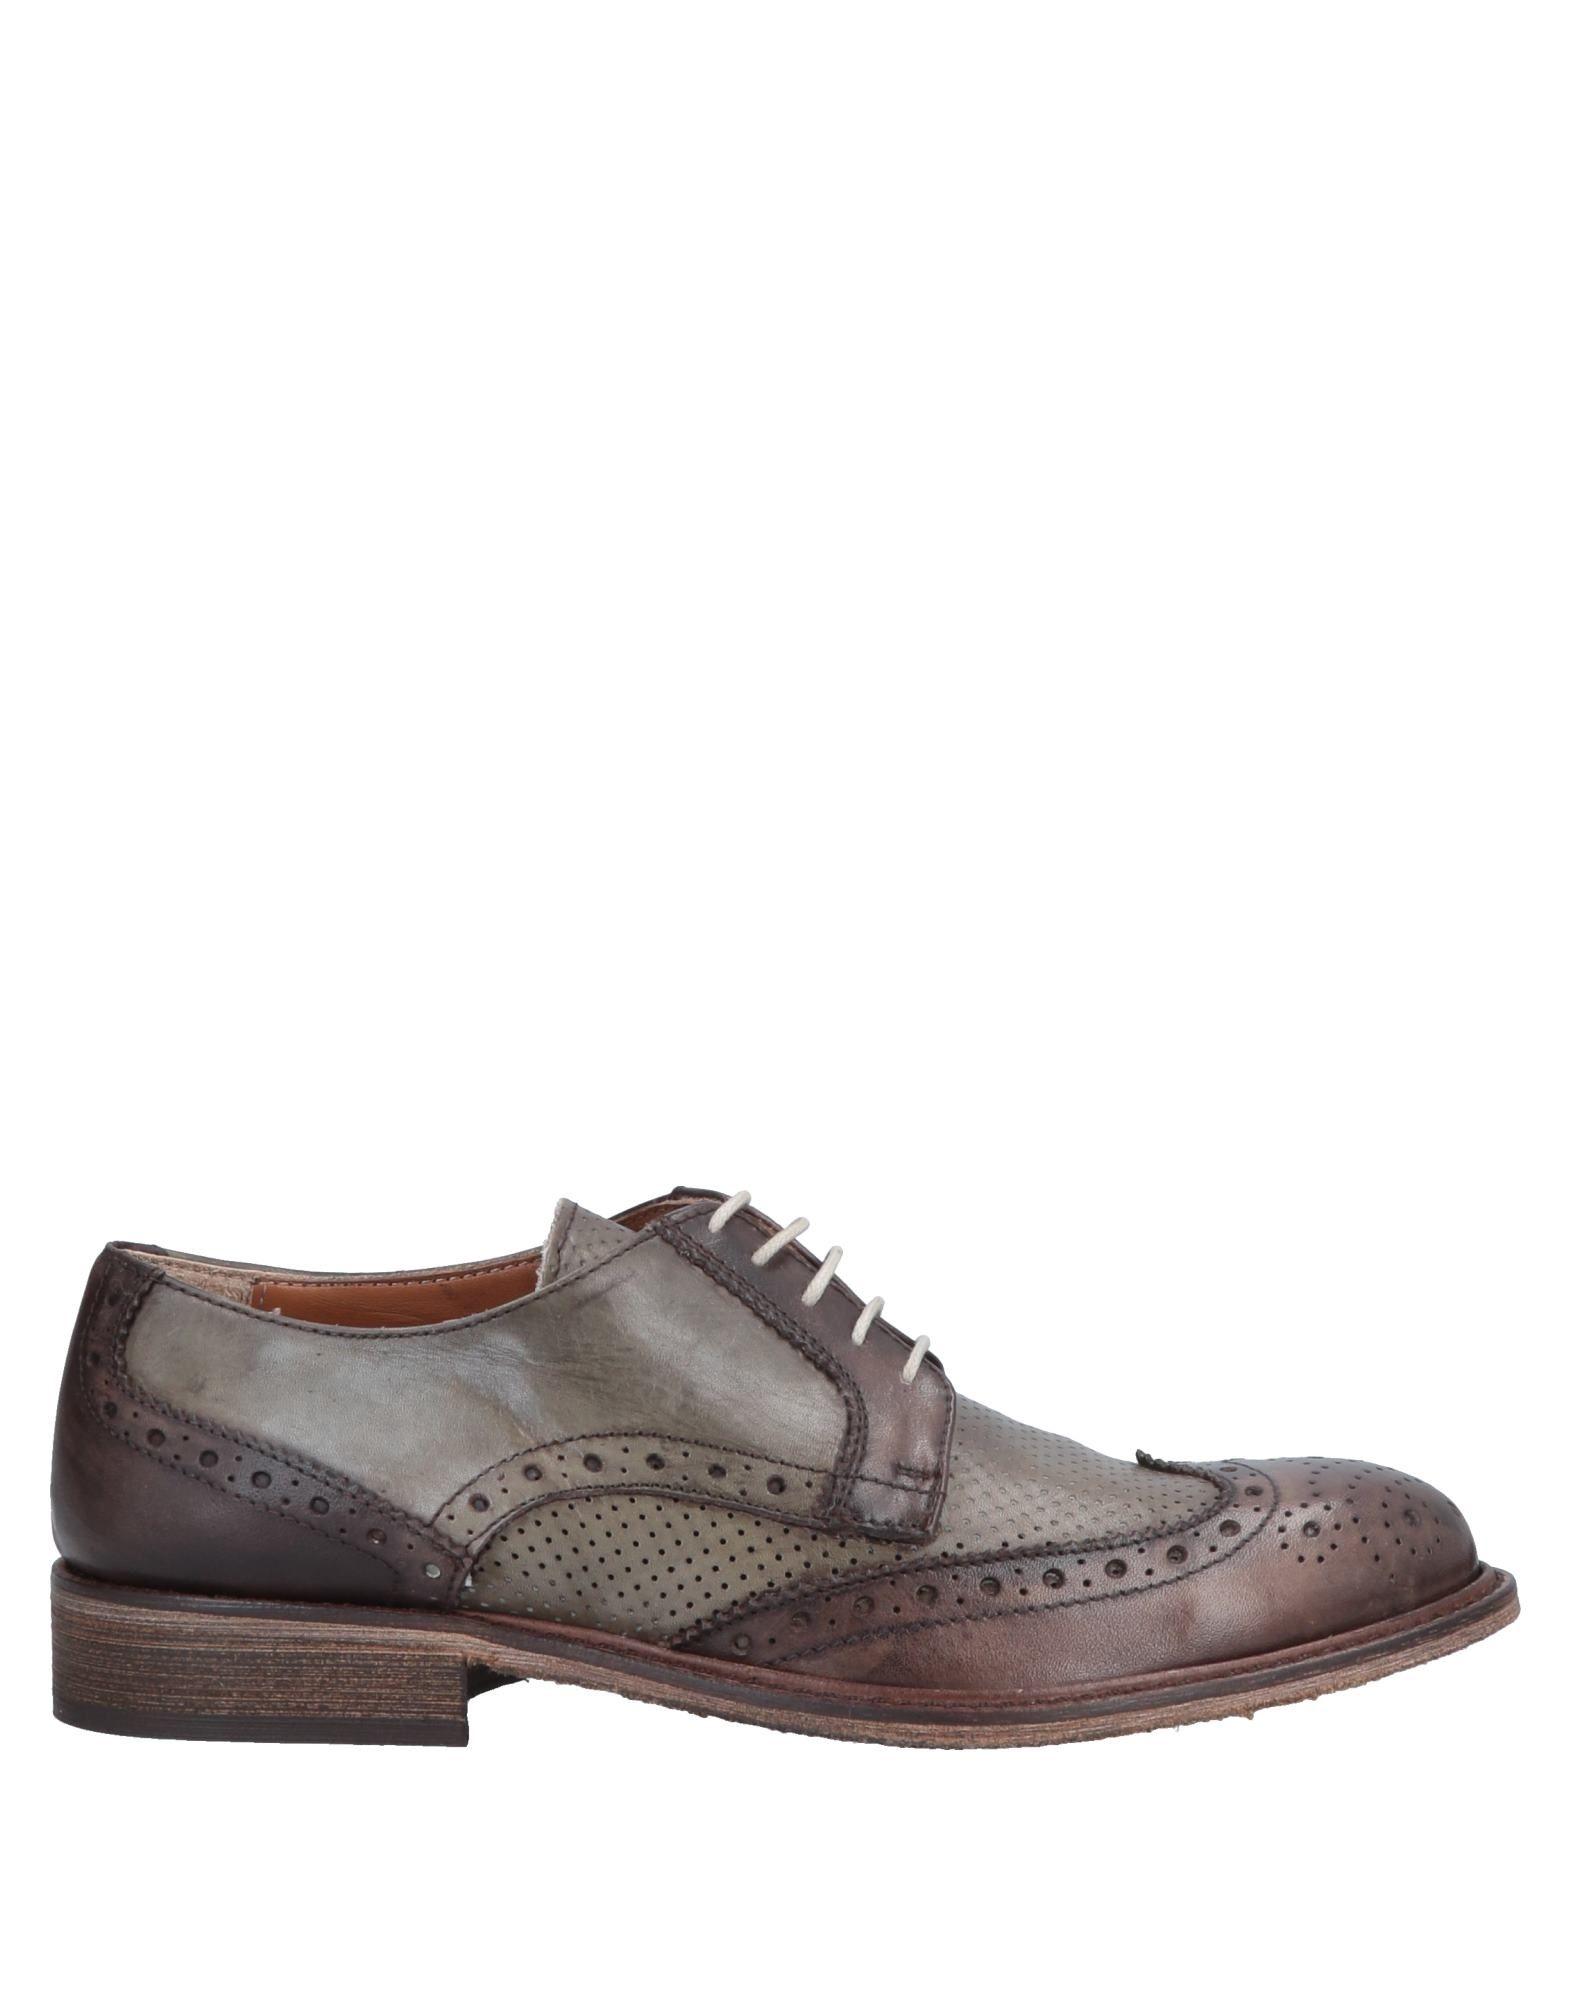 DONATO EST 1969 Обувь на шнурках donato